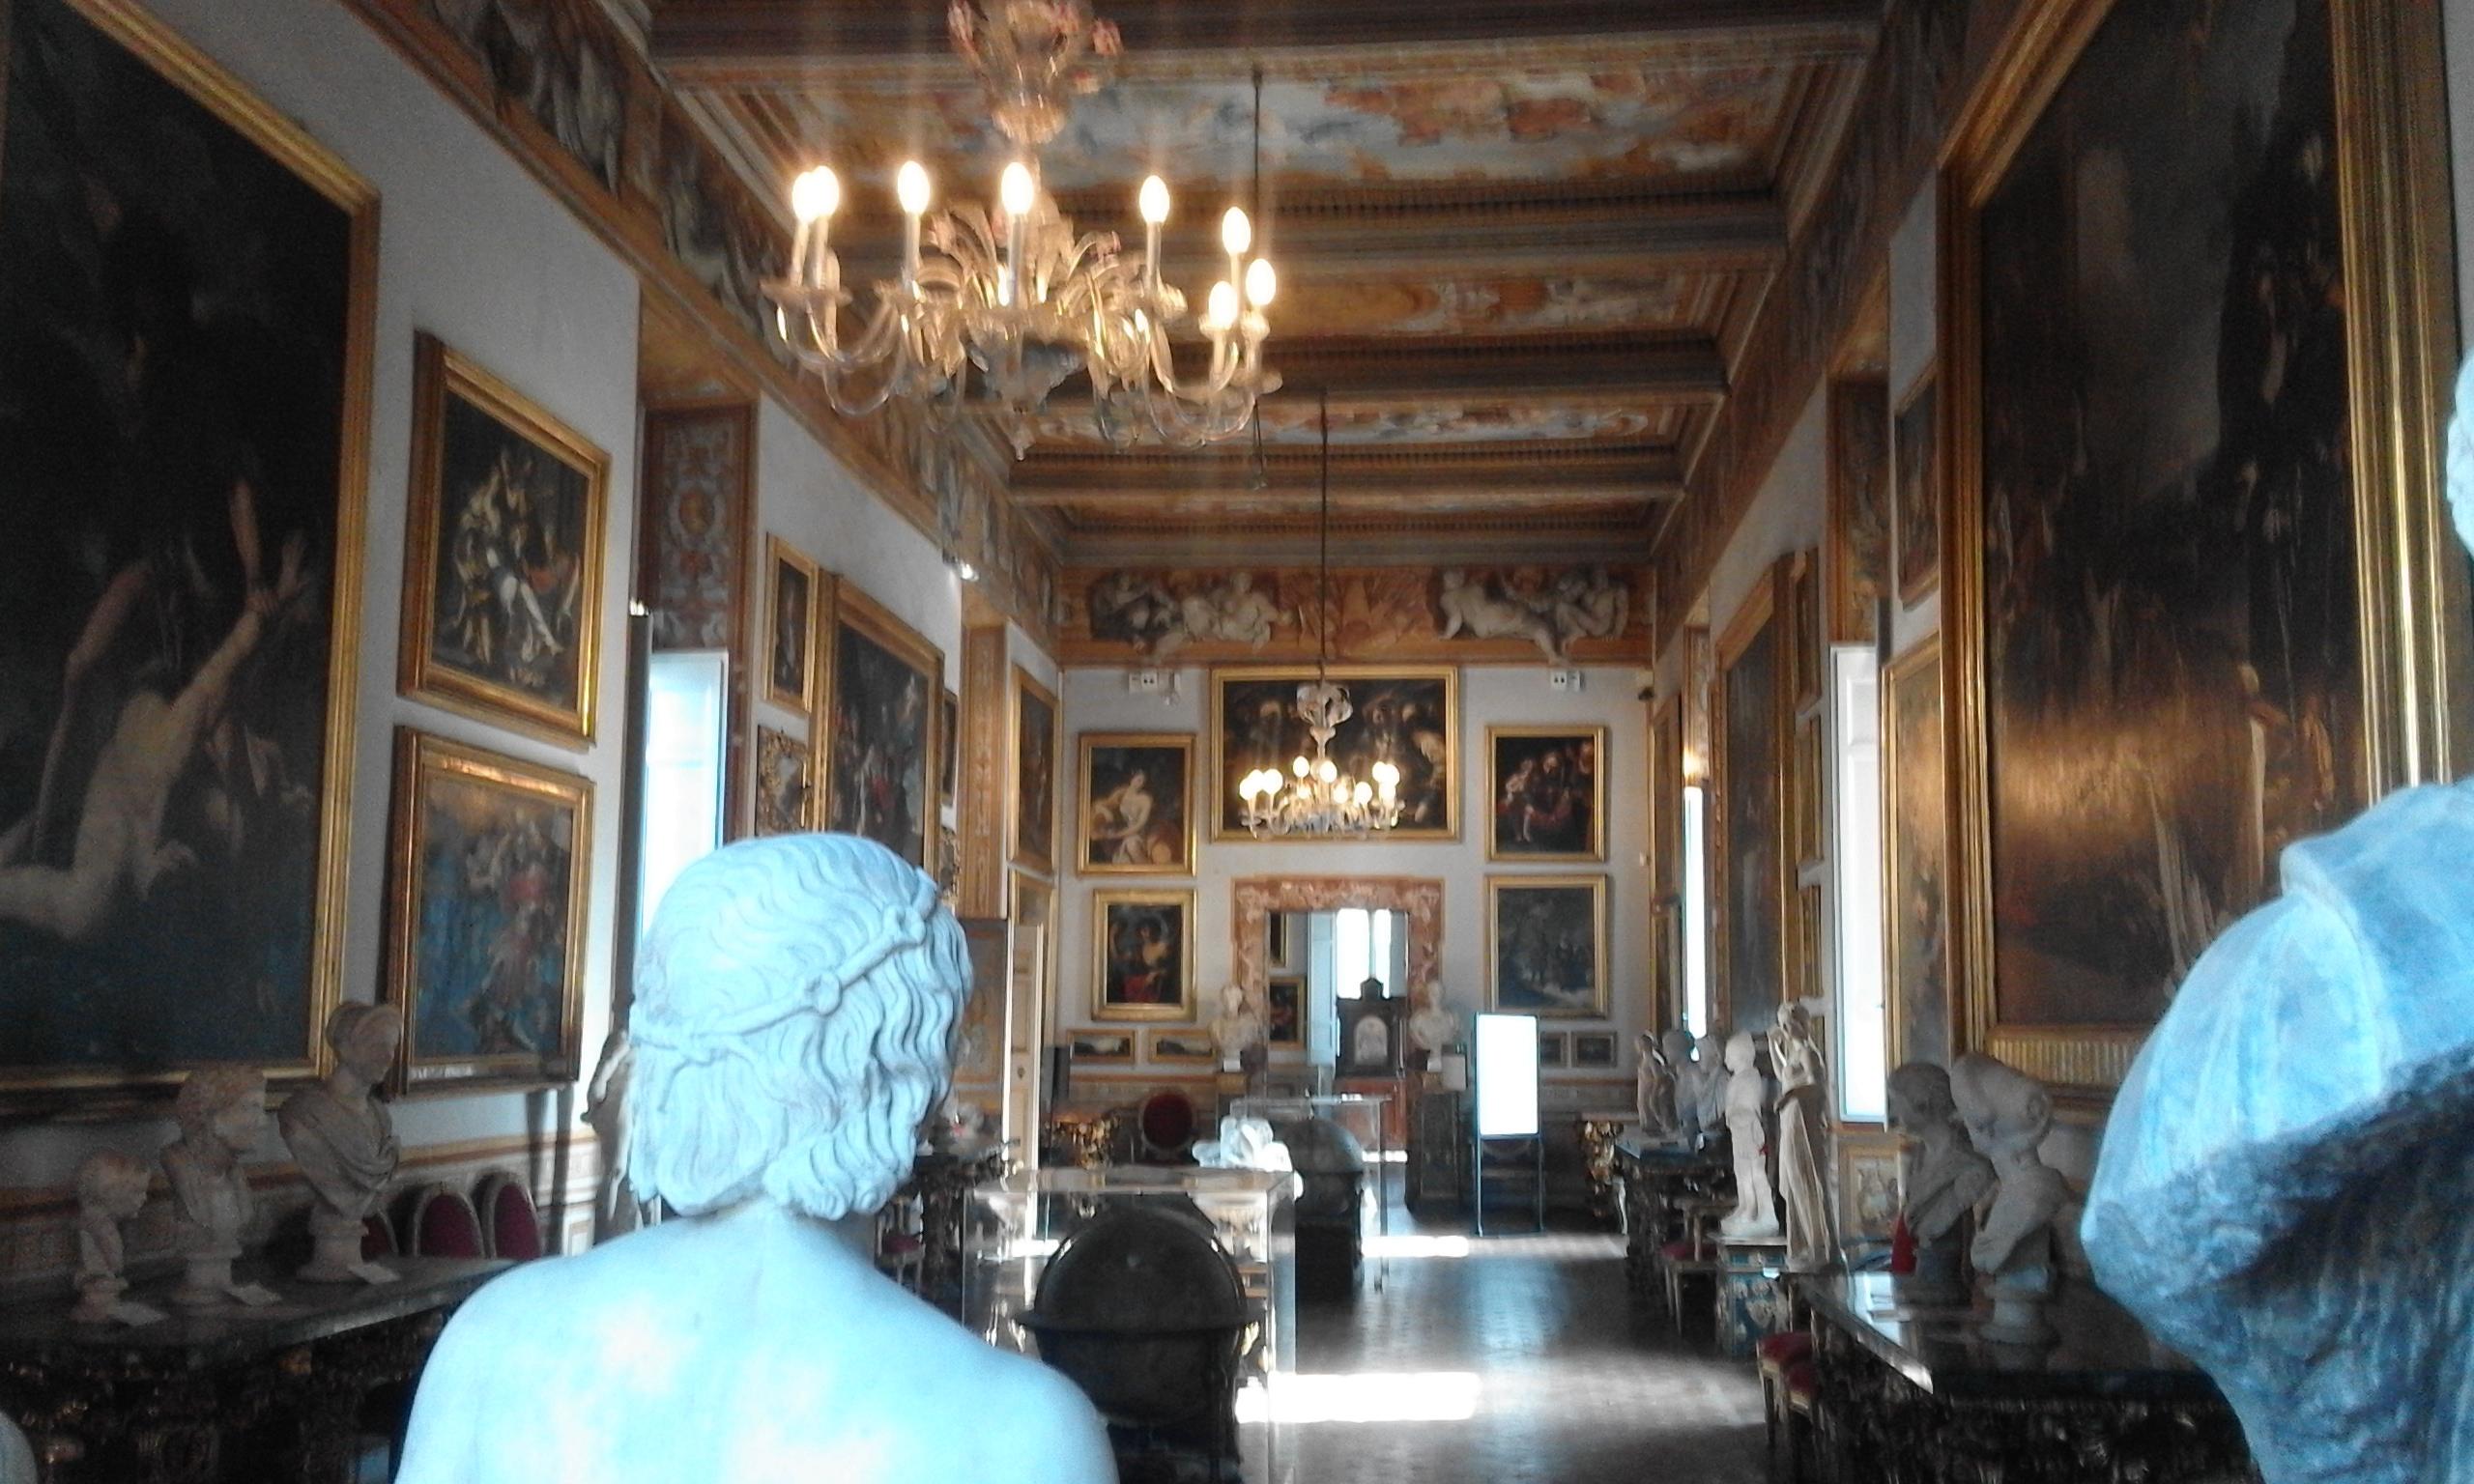 Mузей Спада - Экскурсия по Риму